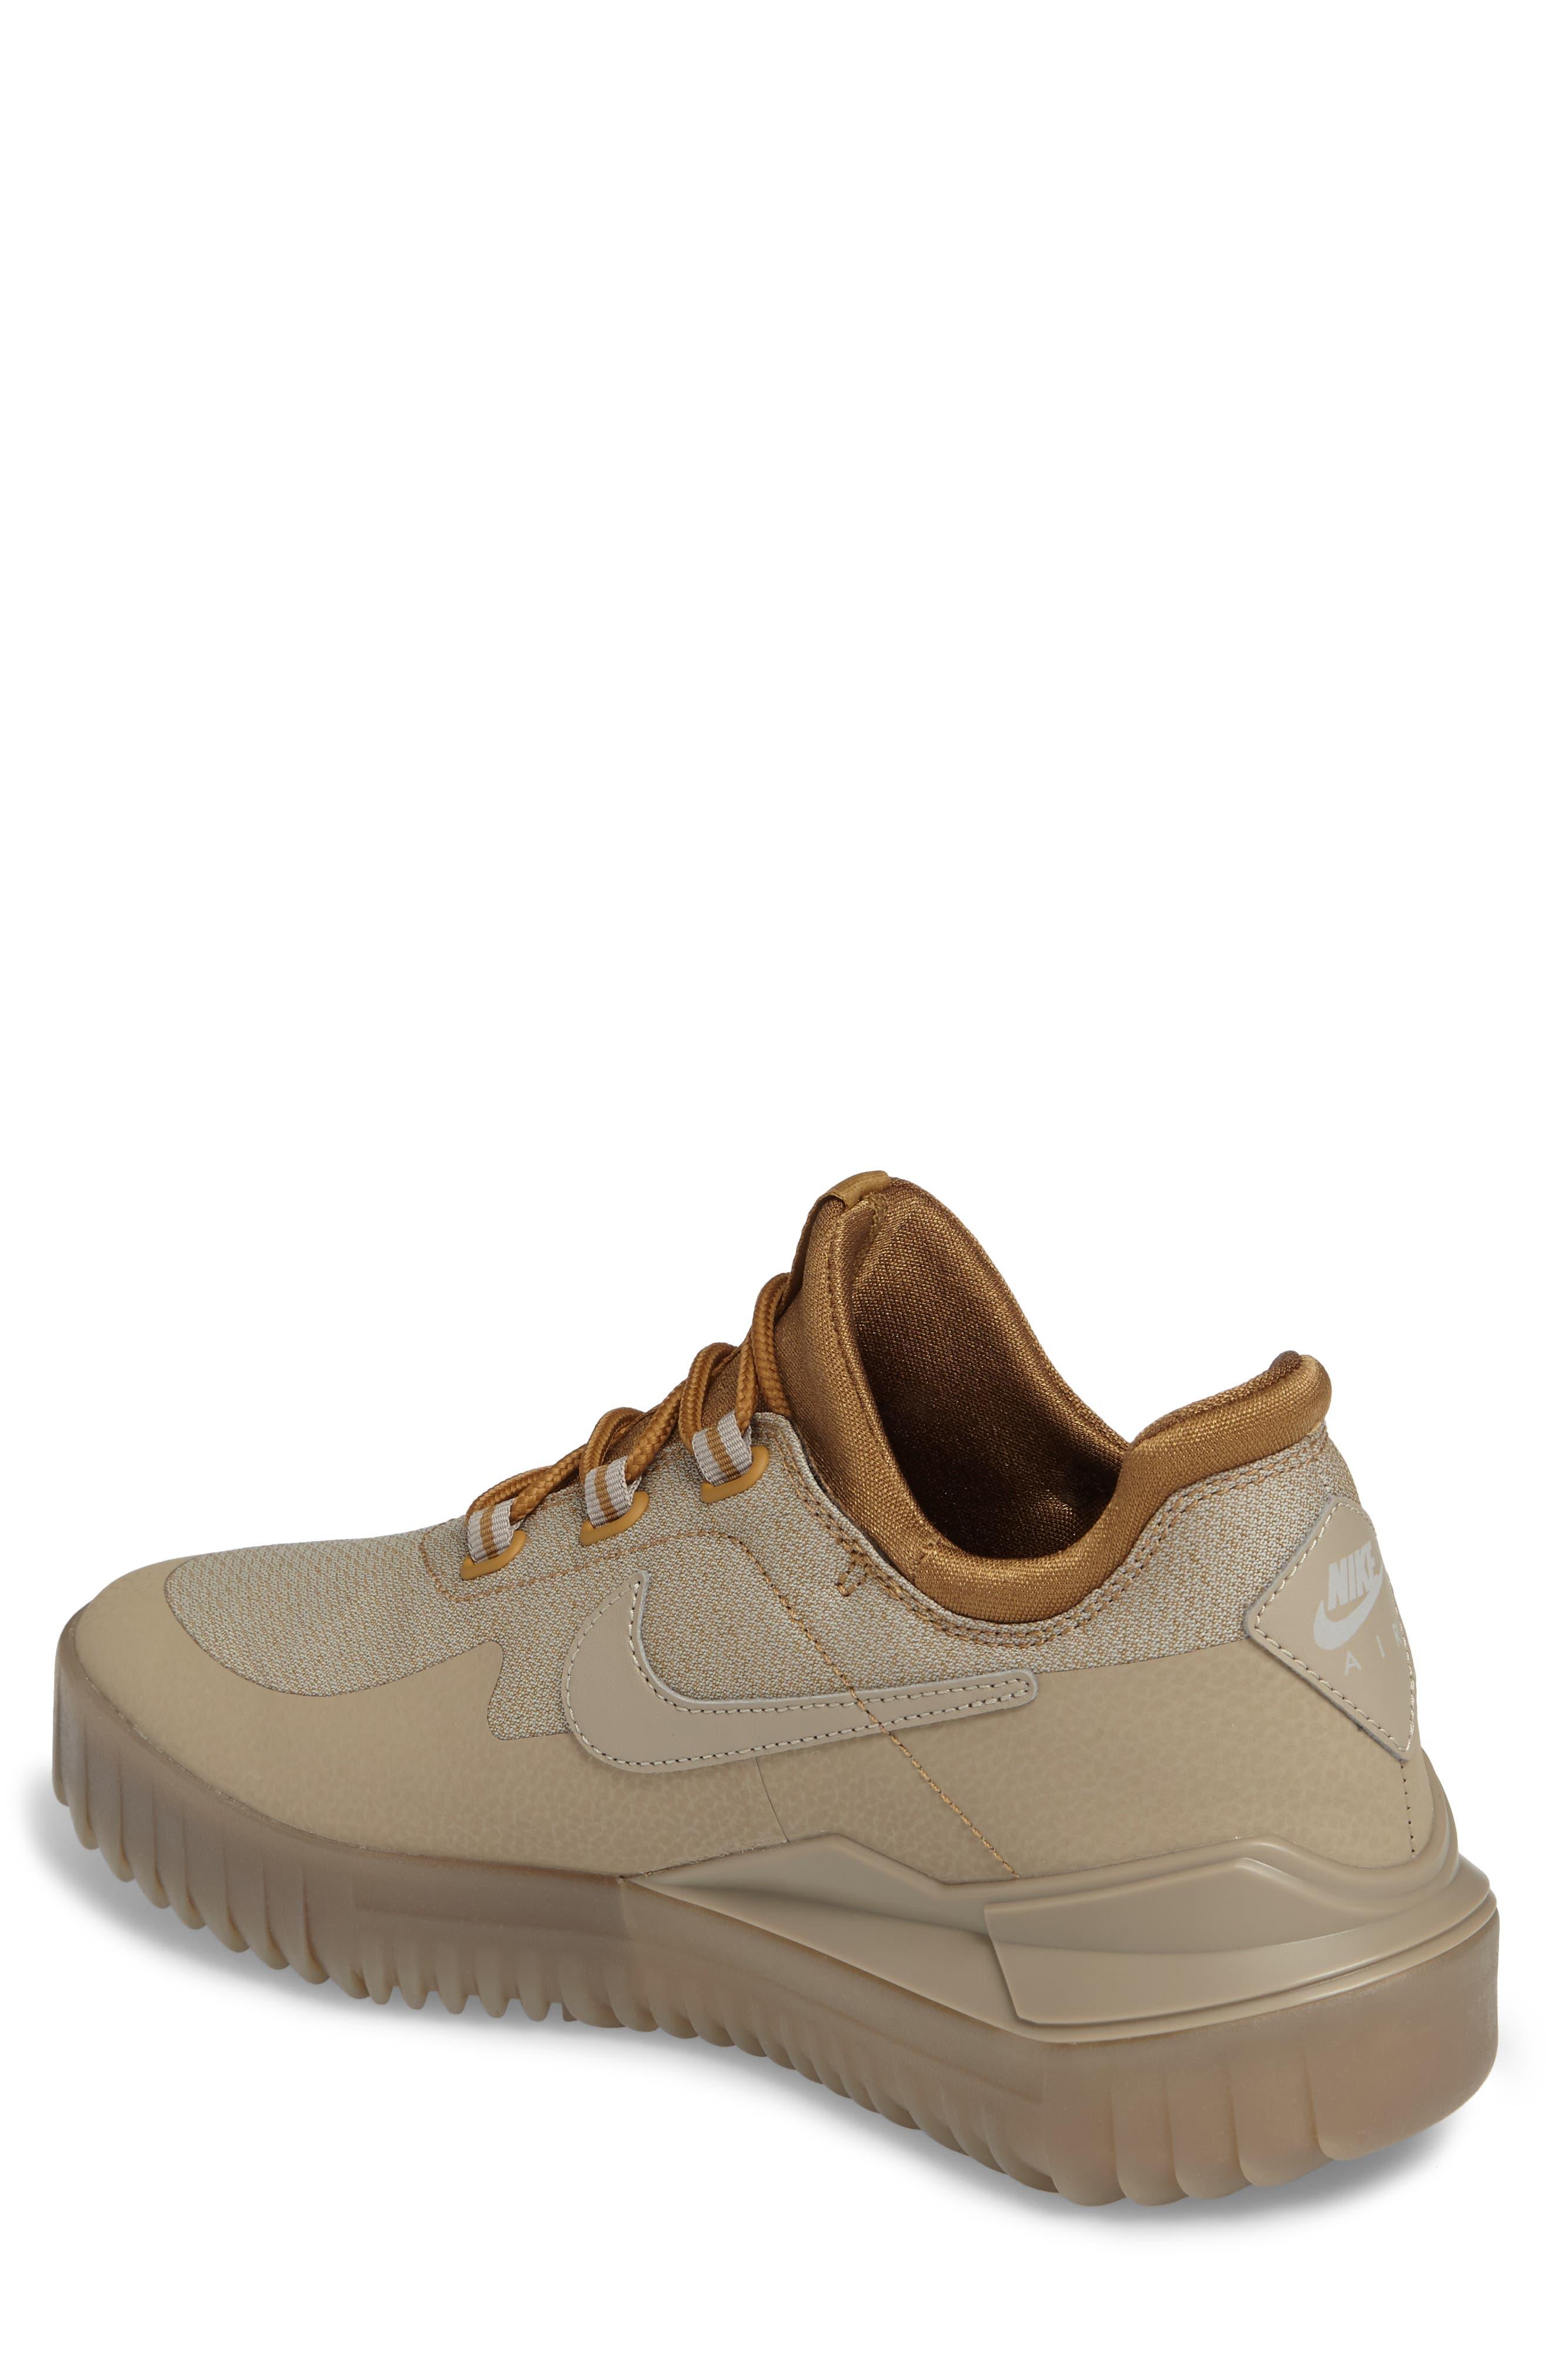 Air Wild Sneaker,                             Alternate thumbnail 5, color,